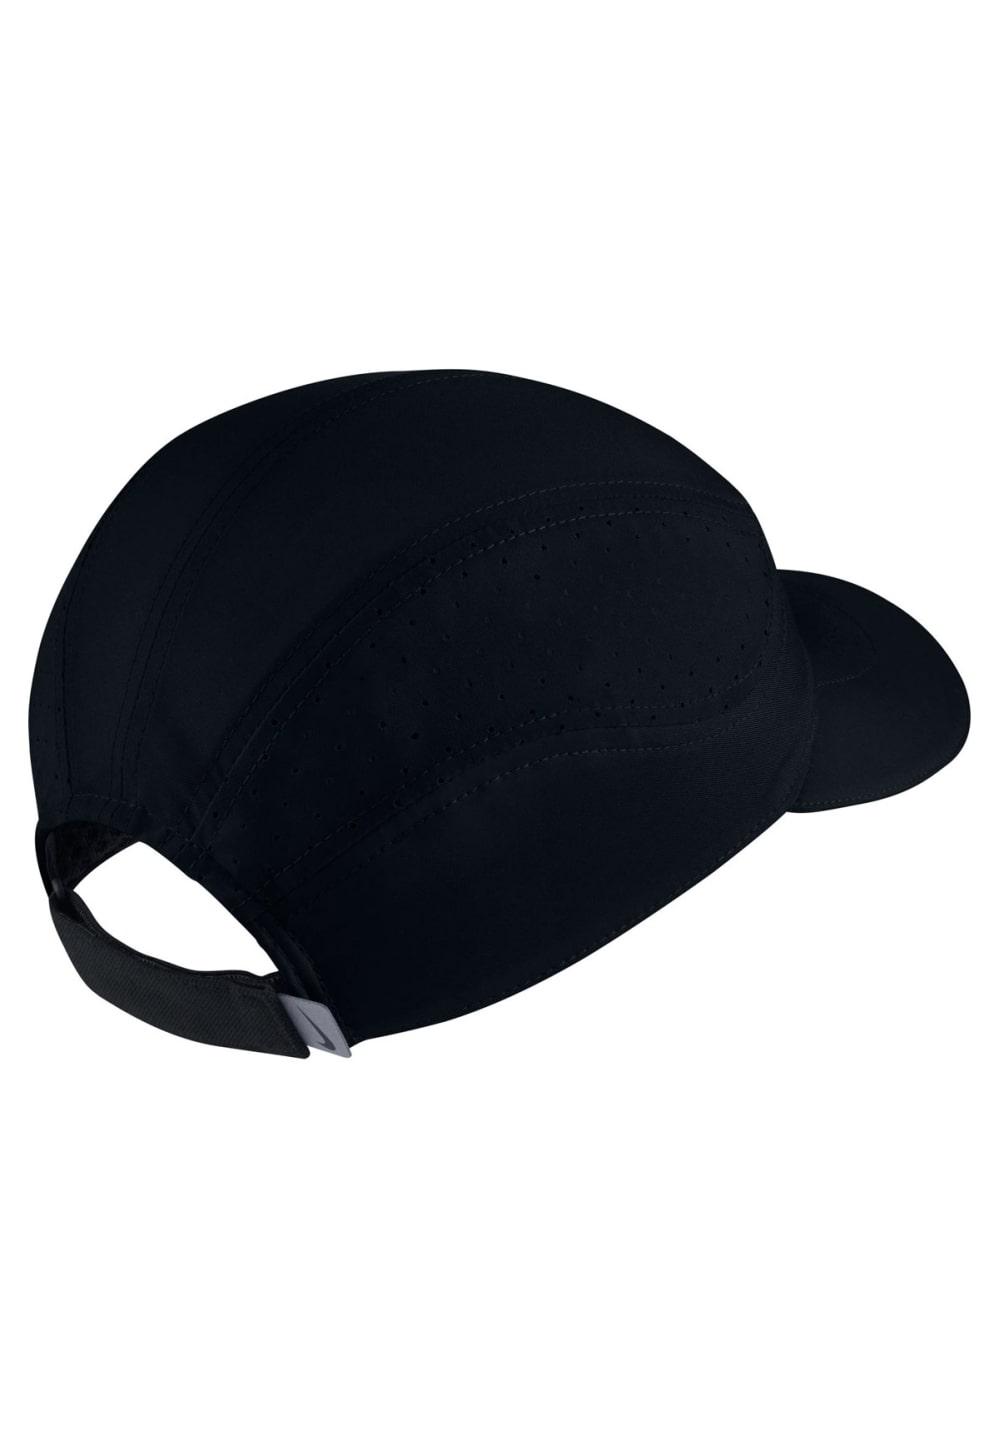 157b3564aa9c9 Nike Aerobill Running Cap - Headdress for Women - Black